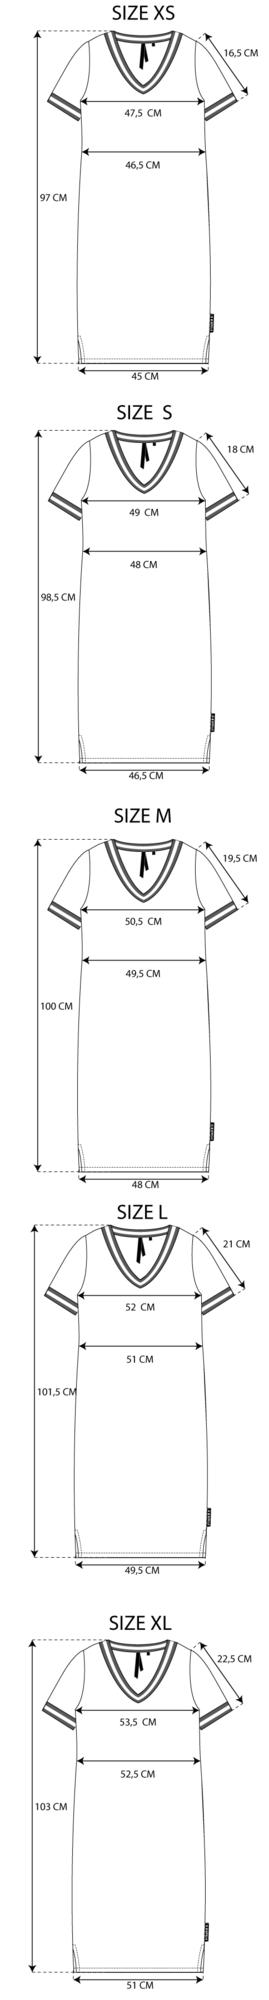 Maattabel Basic Dress V-Neck